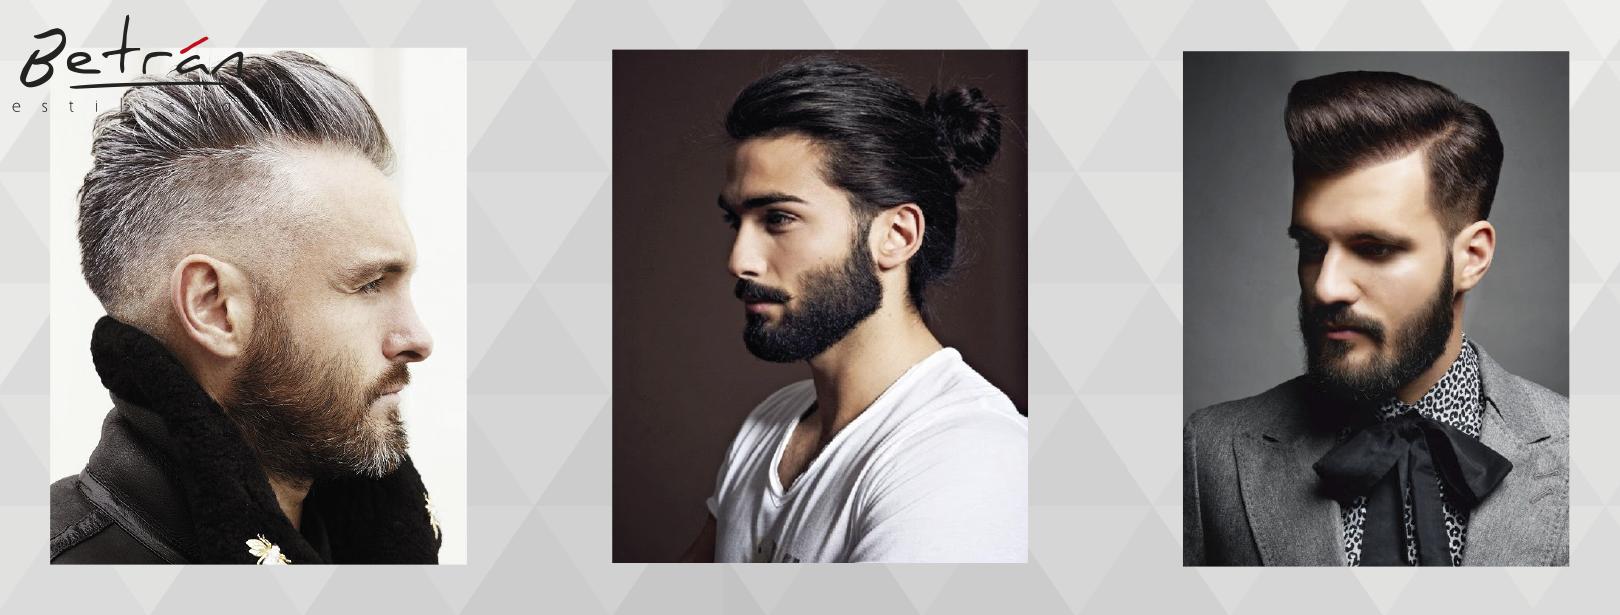 Tendencia barba otoño Betrán estilistas